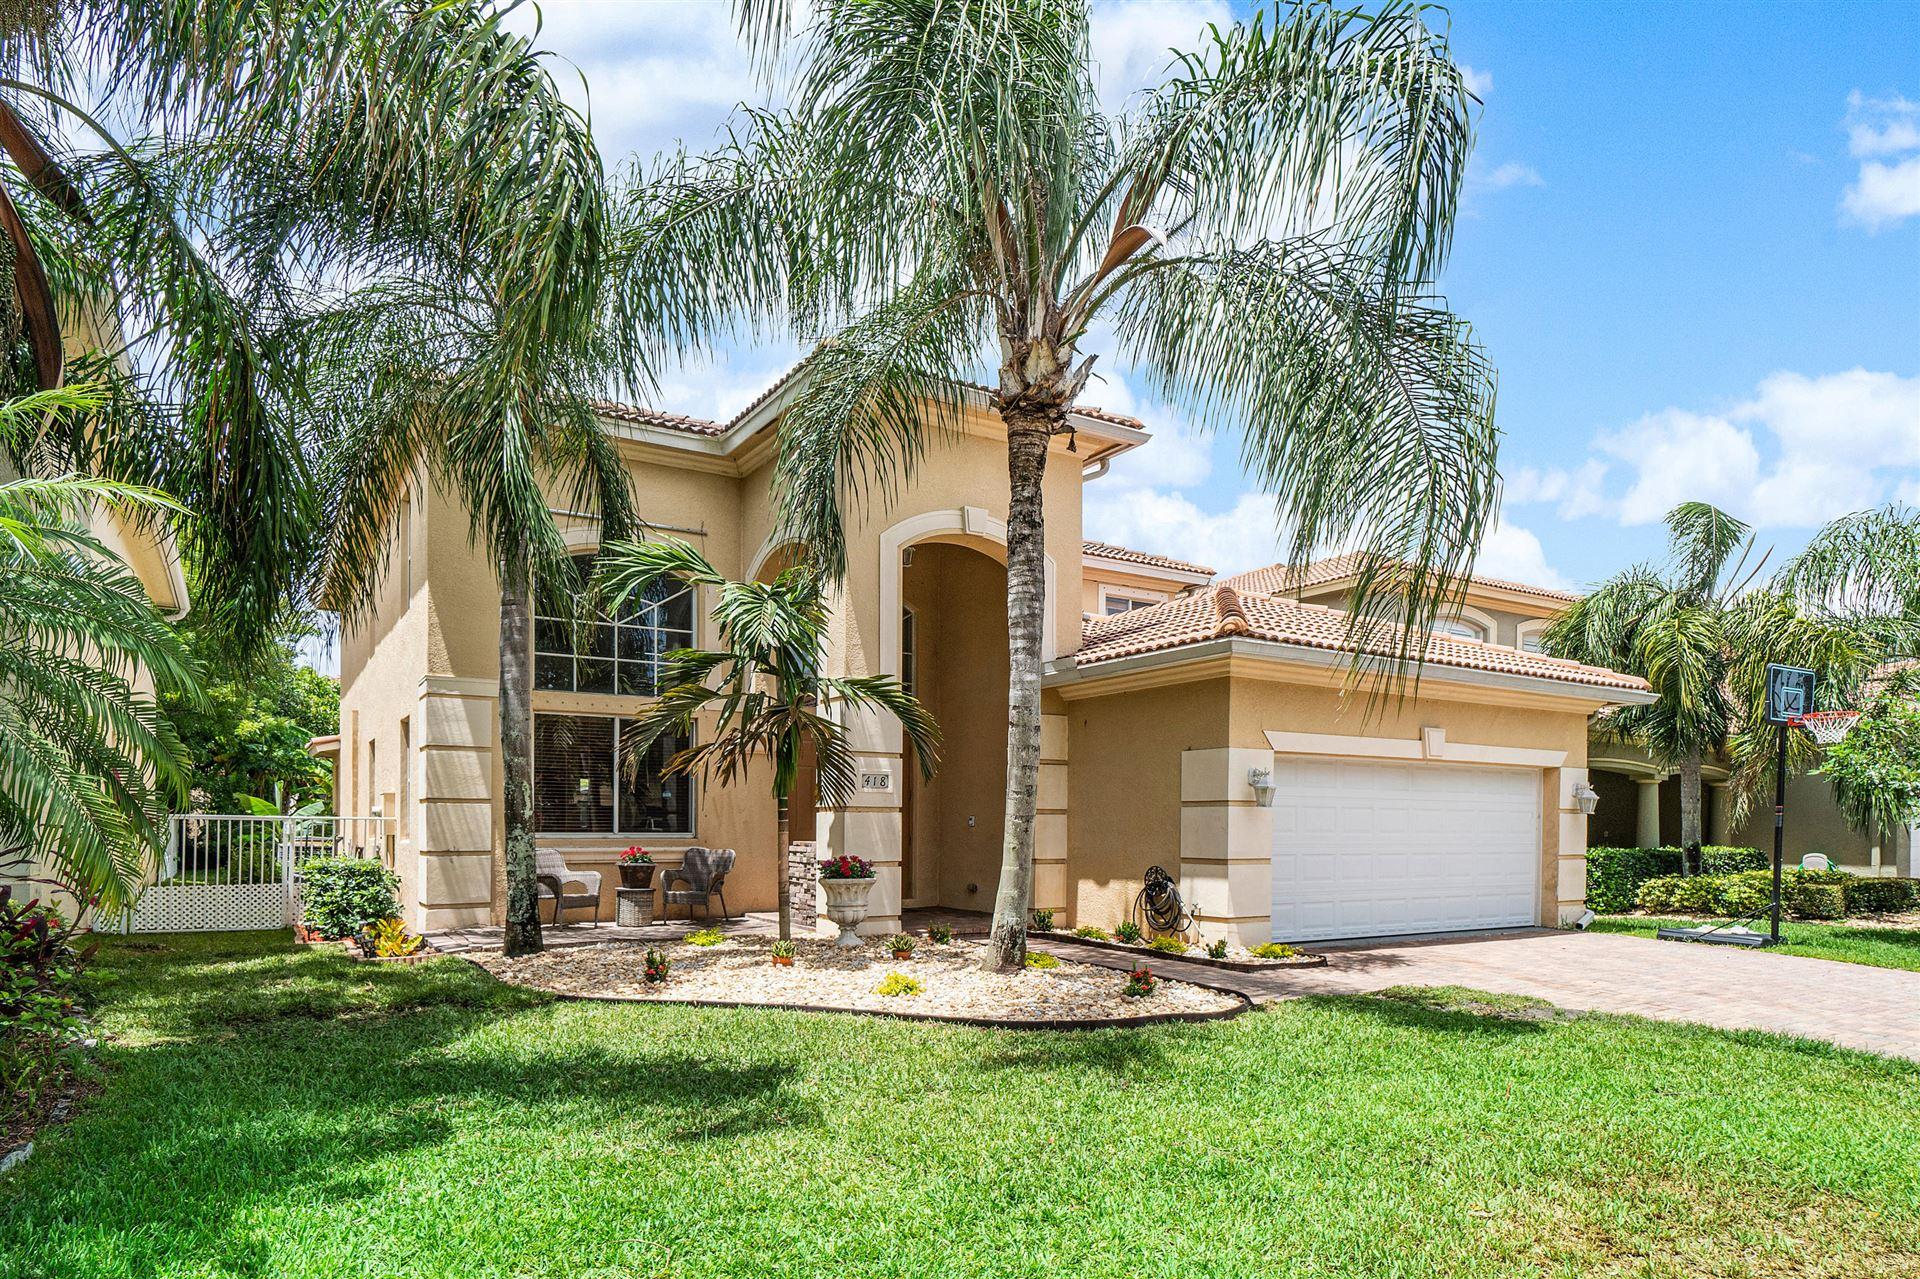 418 Gazetta Way, West Palm Beach, FL 33413 - MLS#: RX-10719697